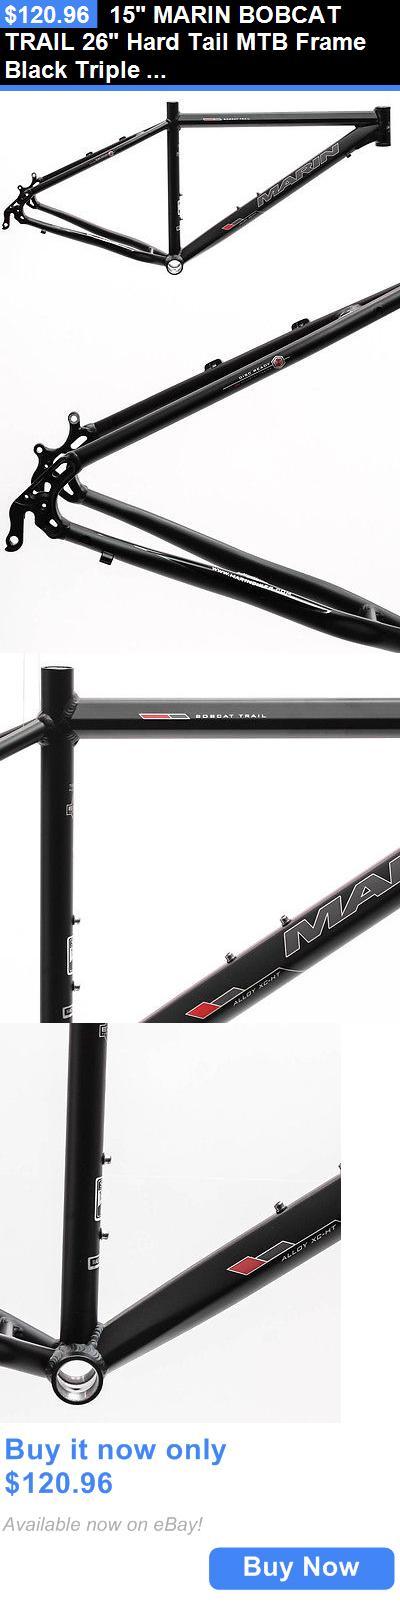 bicycle parts: 15 Marin Bobcat Trail 26 Hard Tail Mtb Frame Black ...